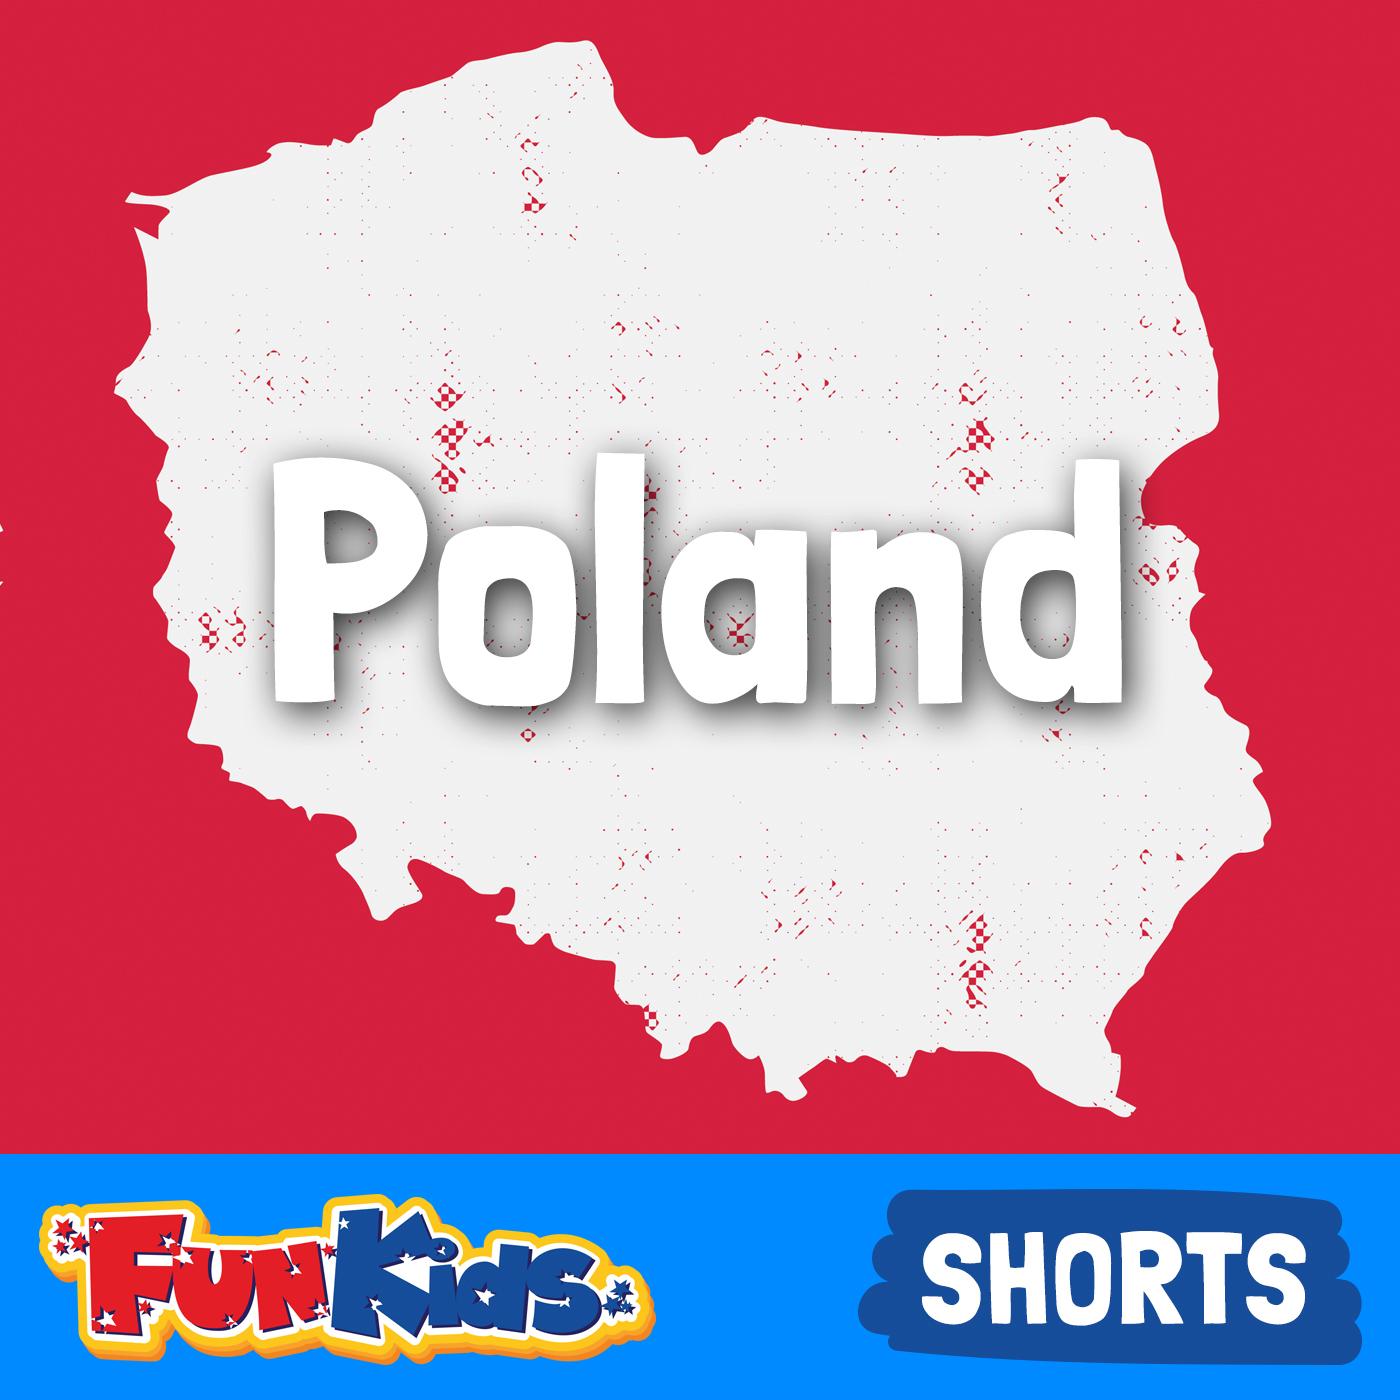 Fun Kids Guide to Poland